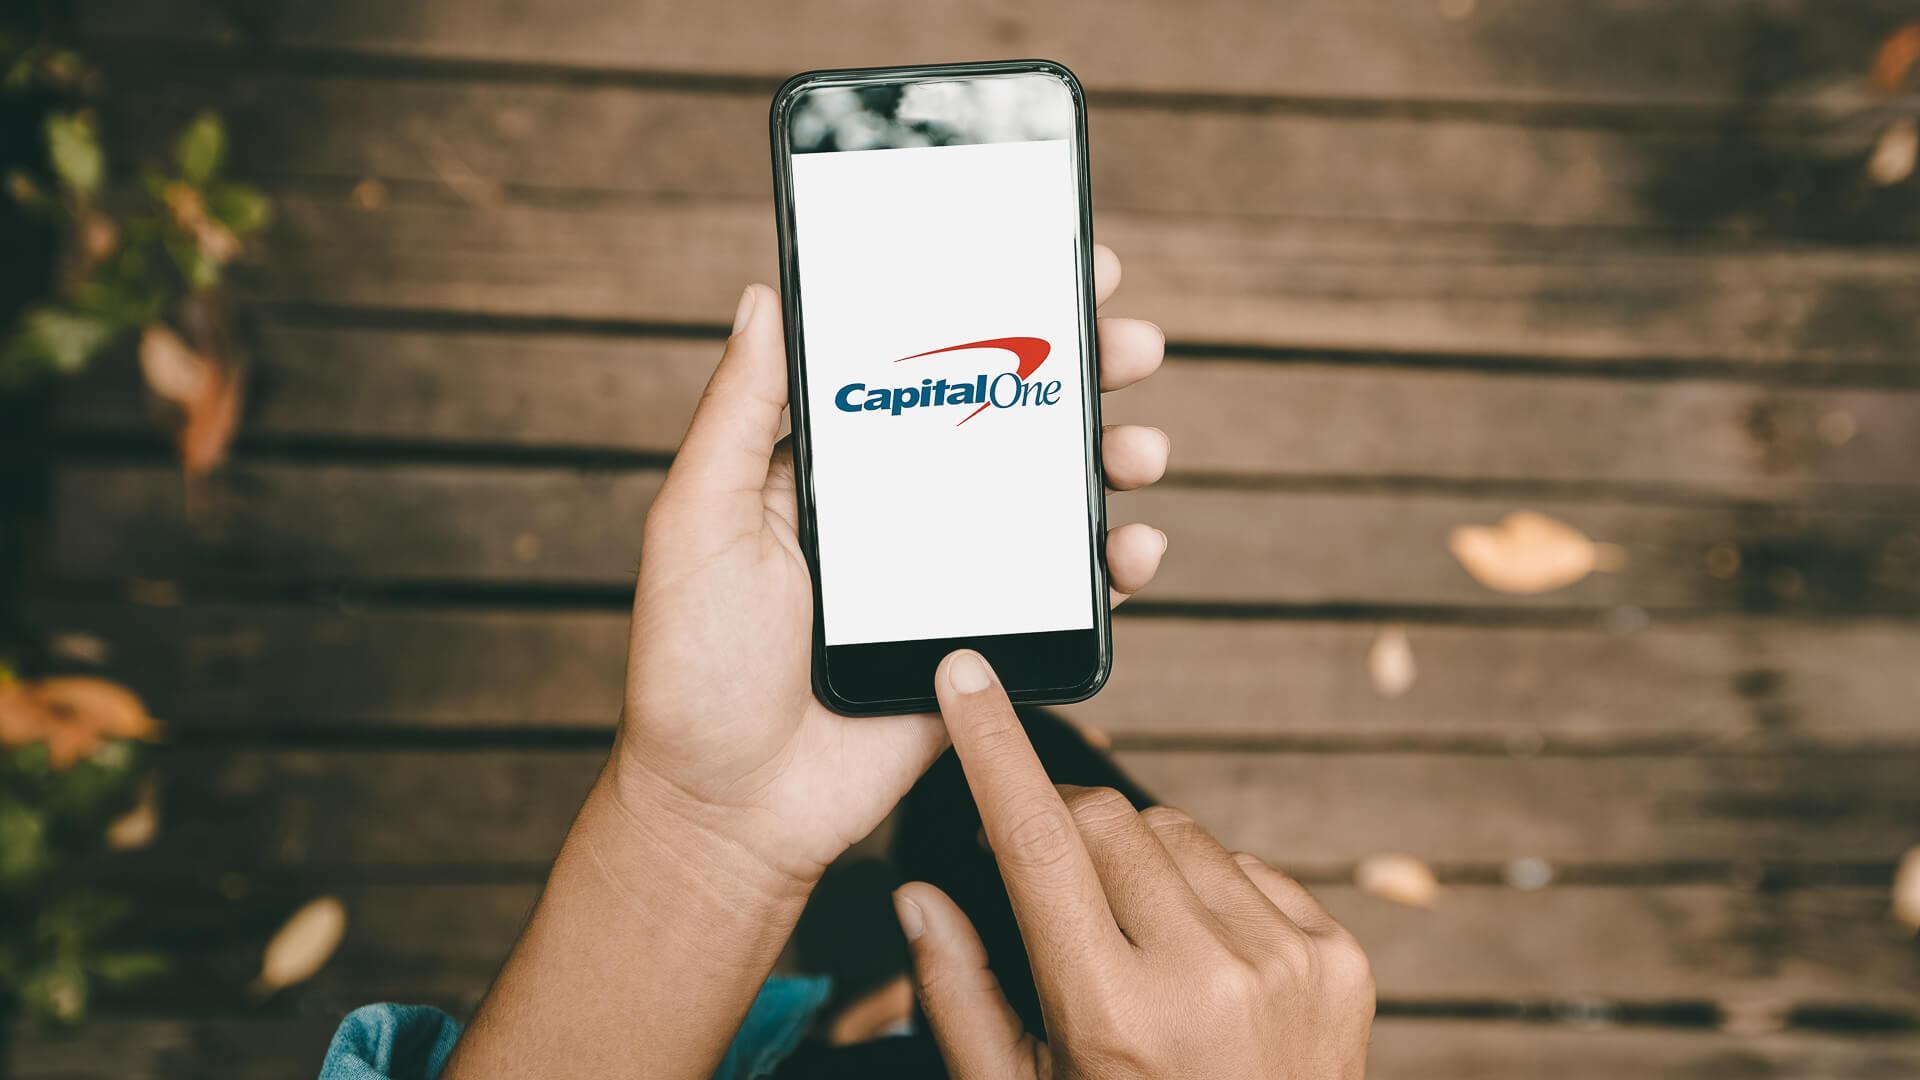 Capital One phone app